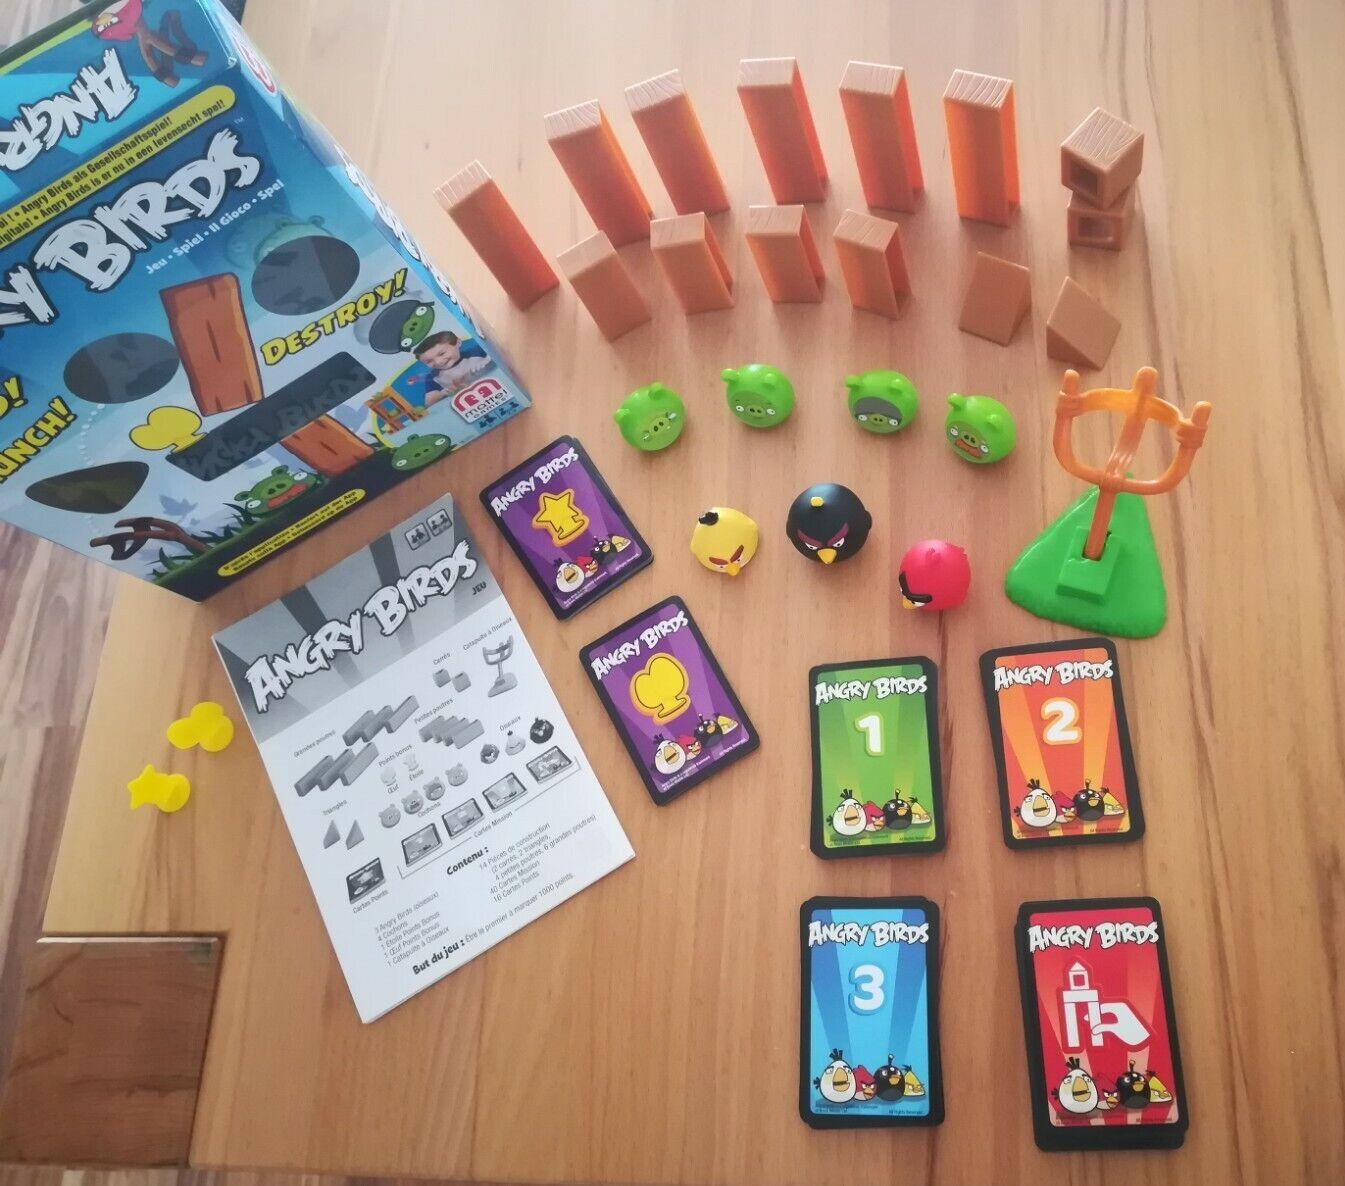 Angry Birds Spiel, Mattel